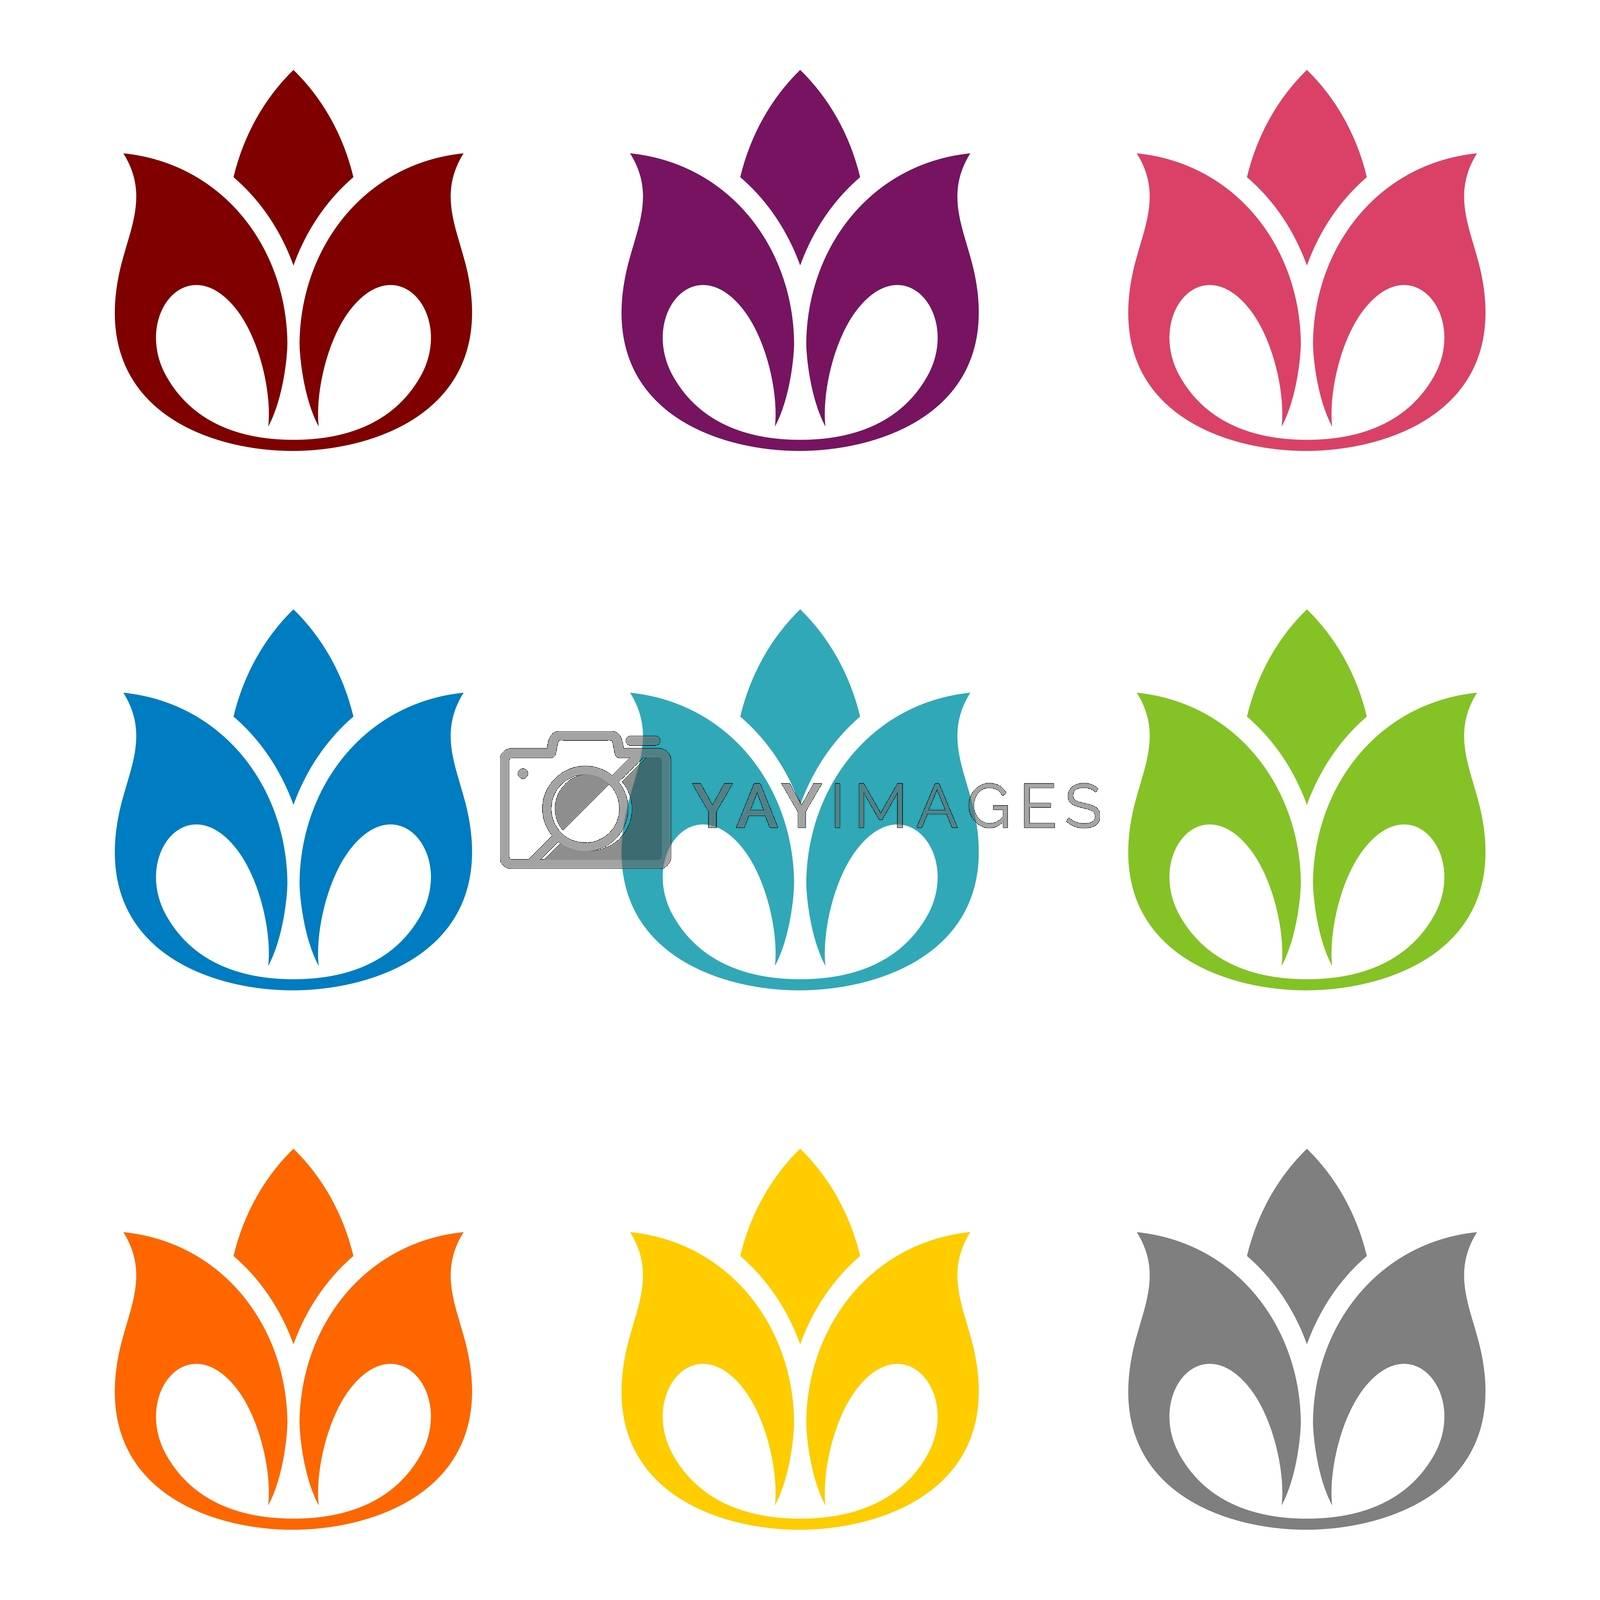 Lotus Flower Ornamental Logo Template Illustration Design. Vector EPS 10.